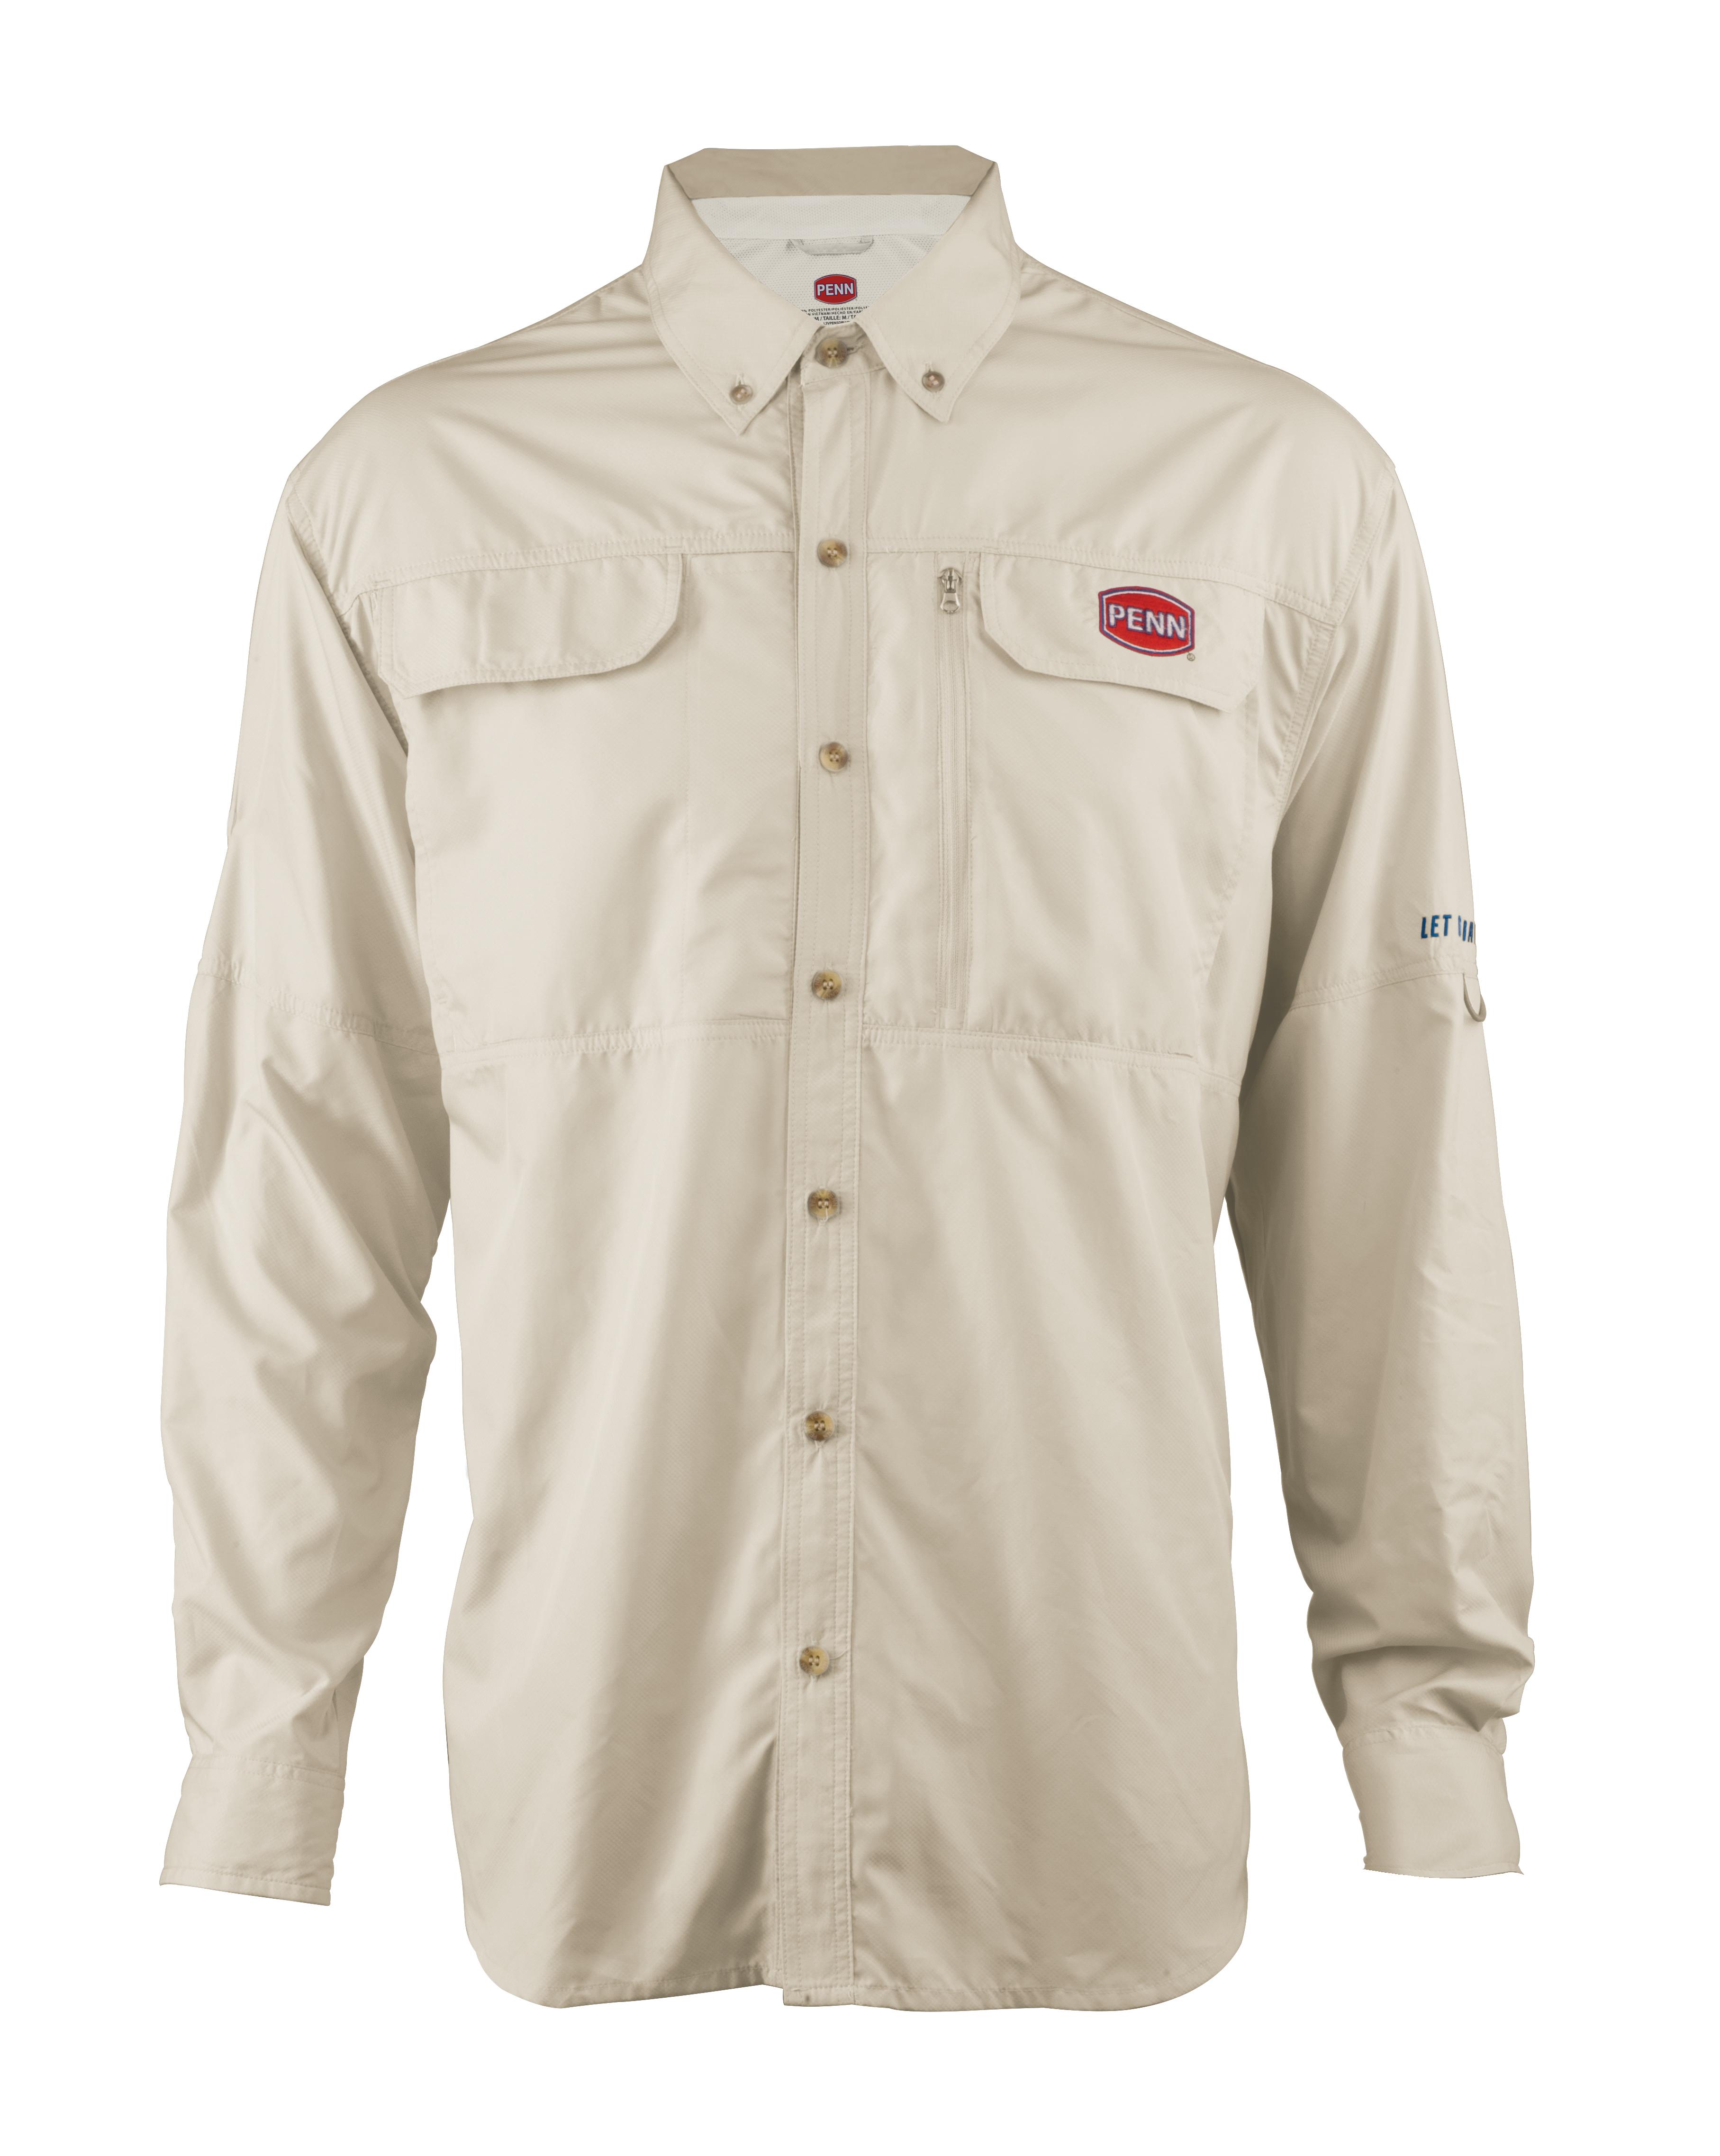 Penn vented performance long sleeve shirt glasgow for Long sleeve performance fishing shirts